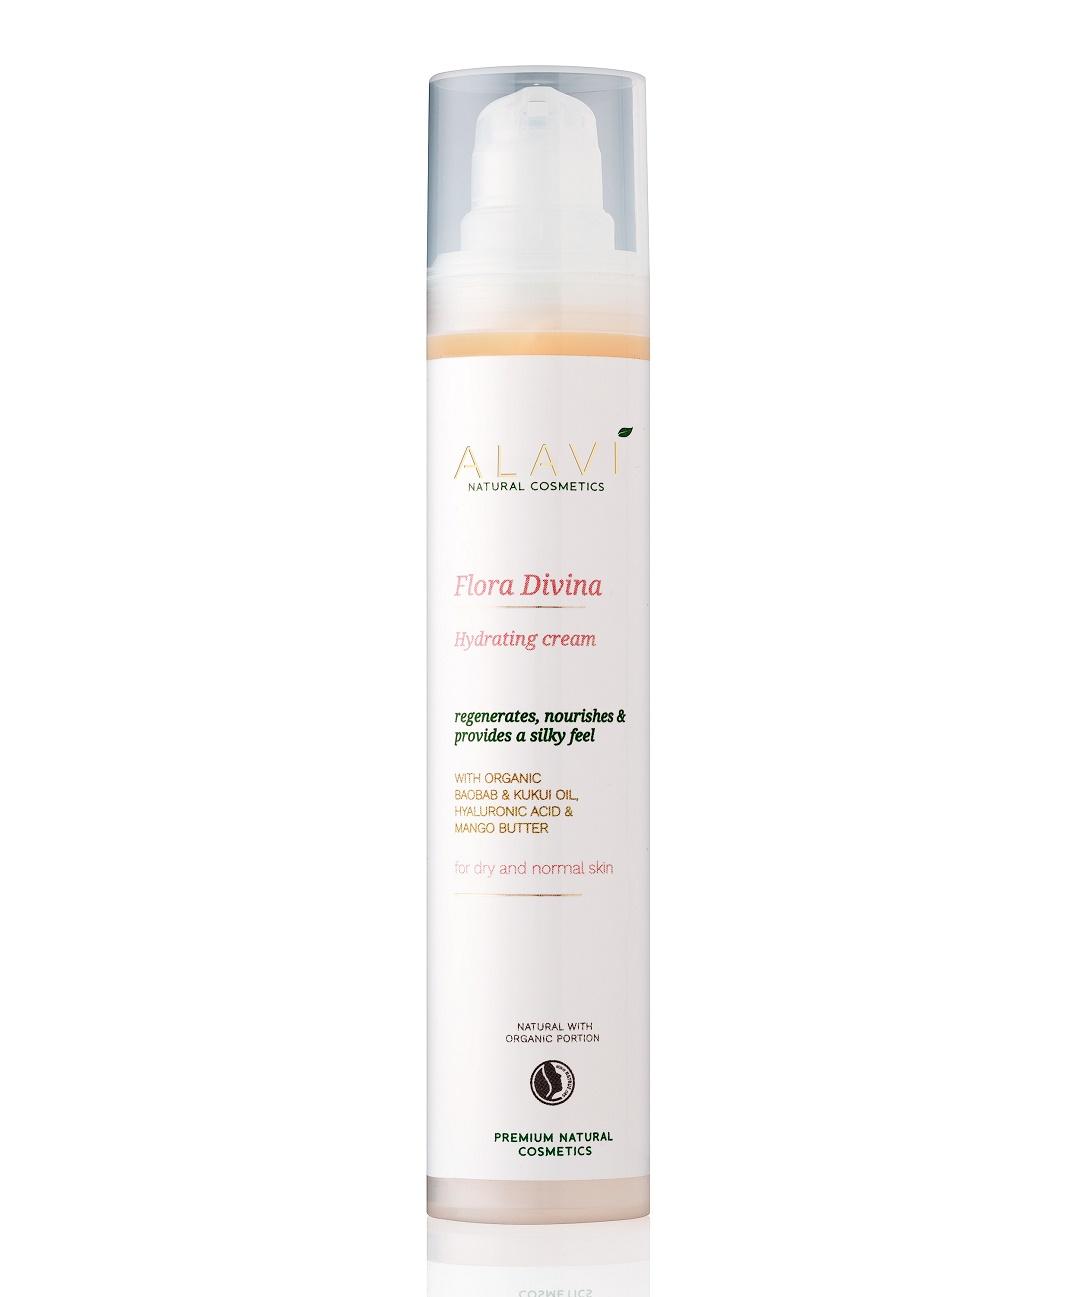 Alavi Flora Divina Hydrating Cream